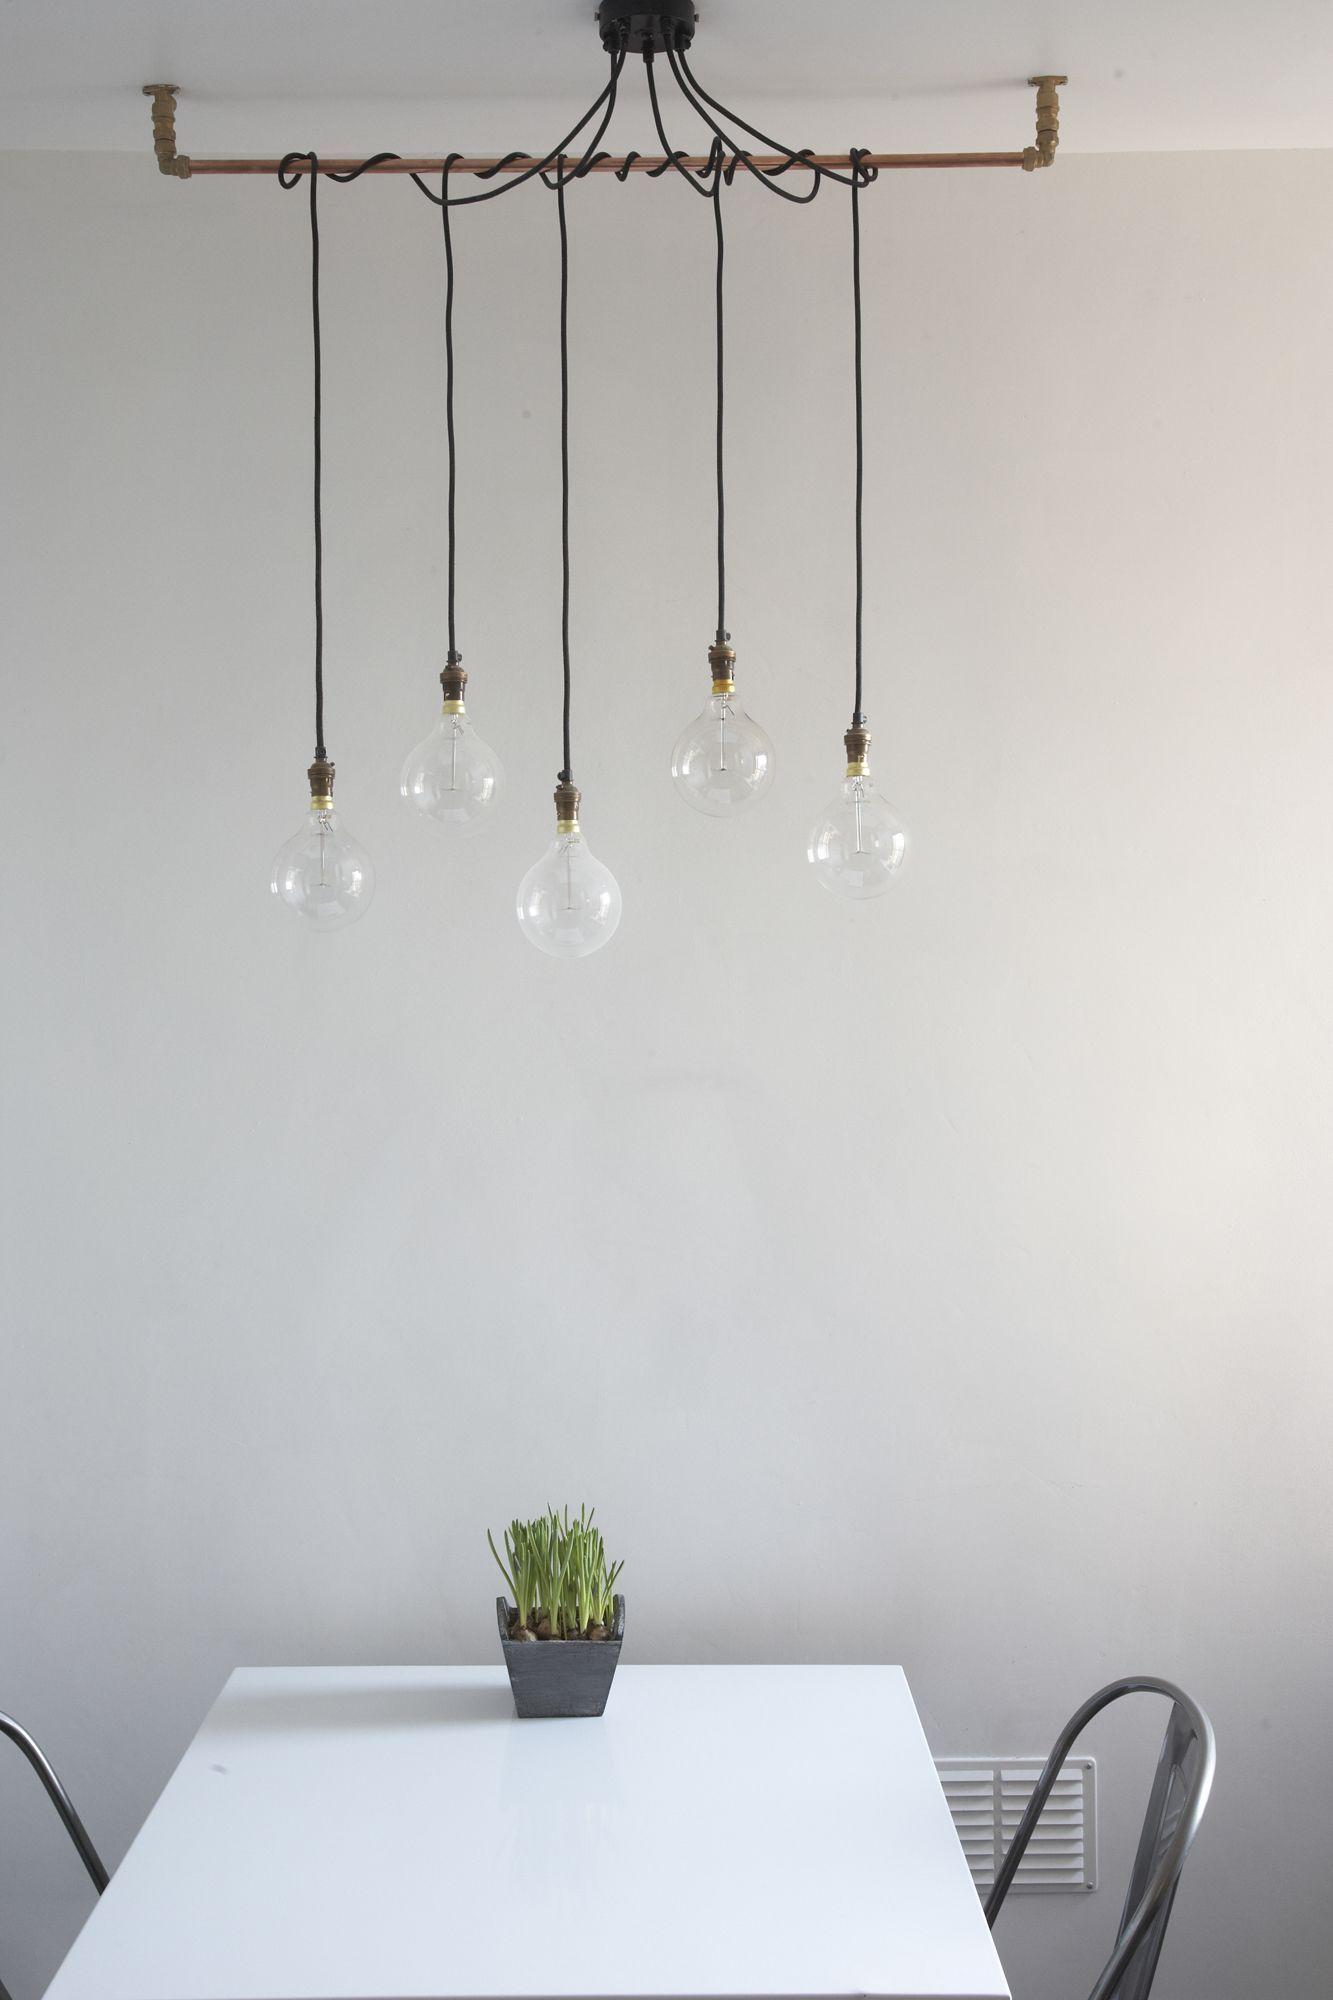 9 Top Living Room Lighting Ideas Living Room Lighting Decor Simple Lighting